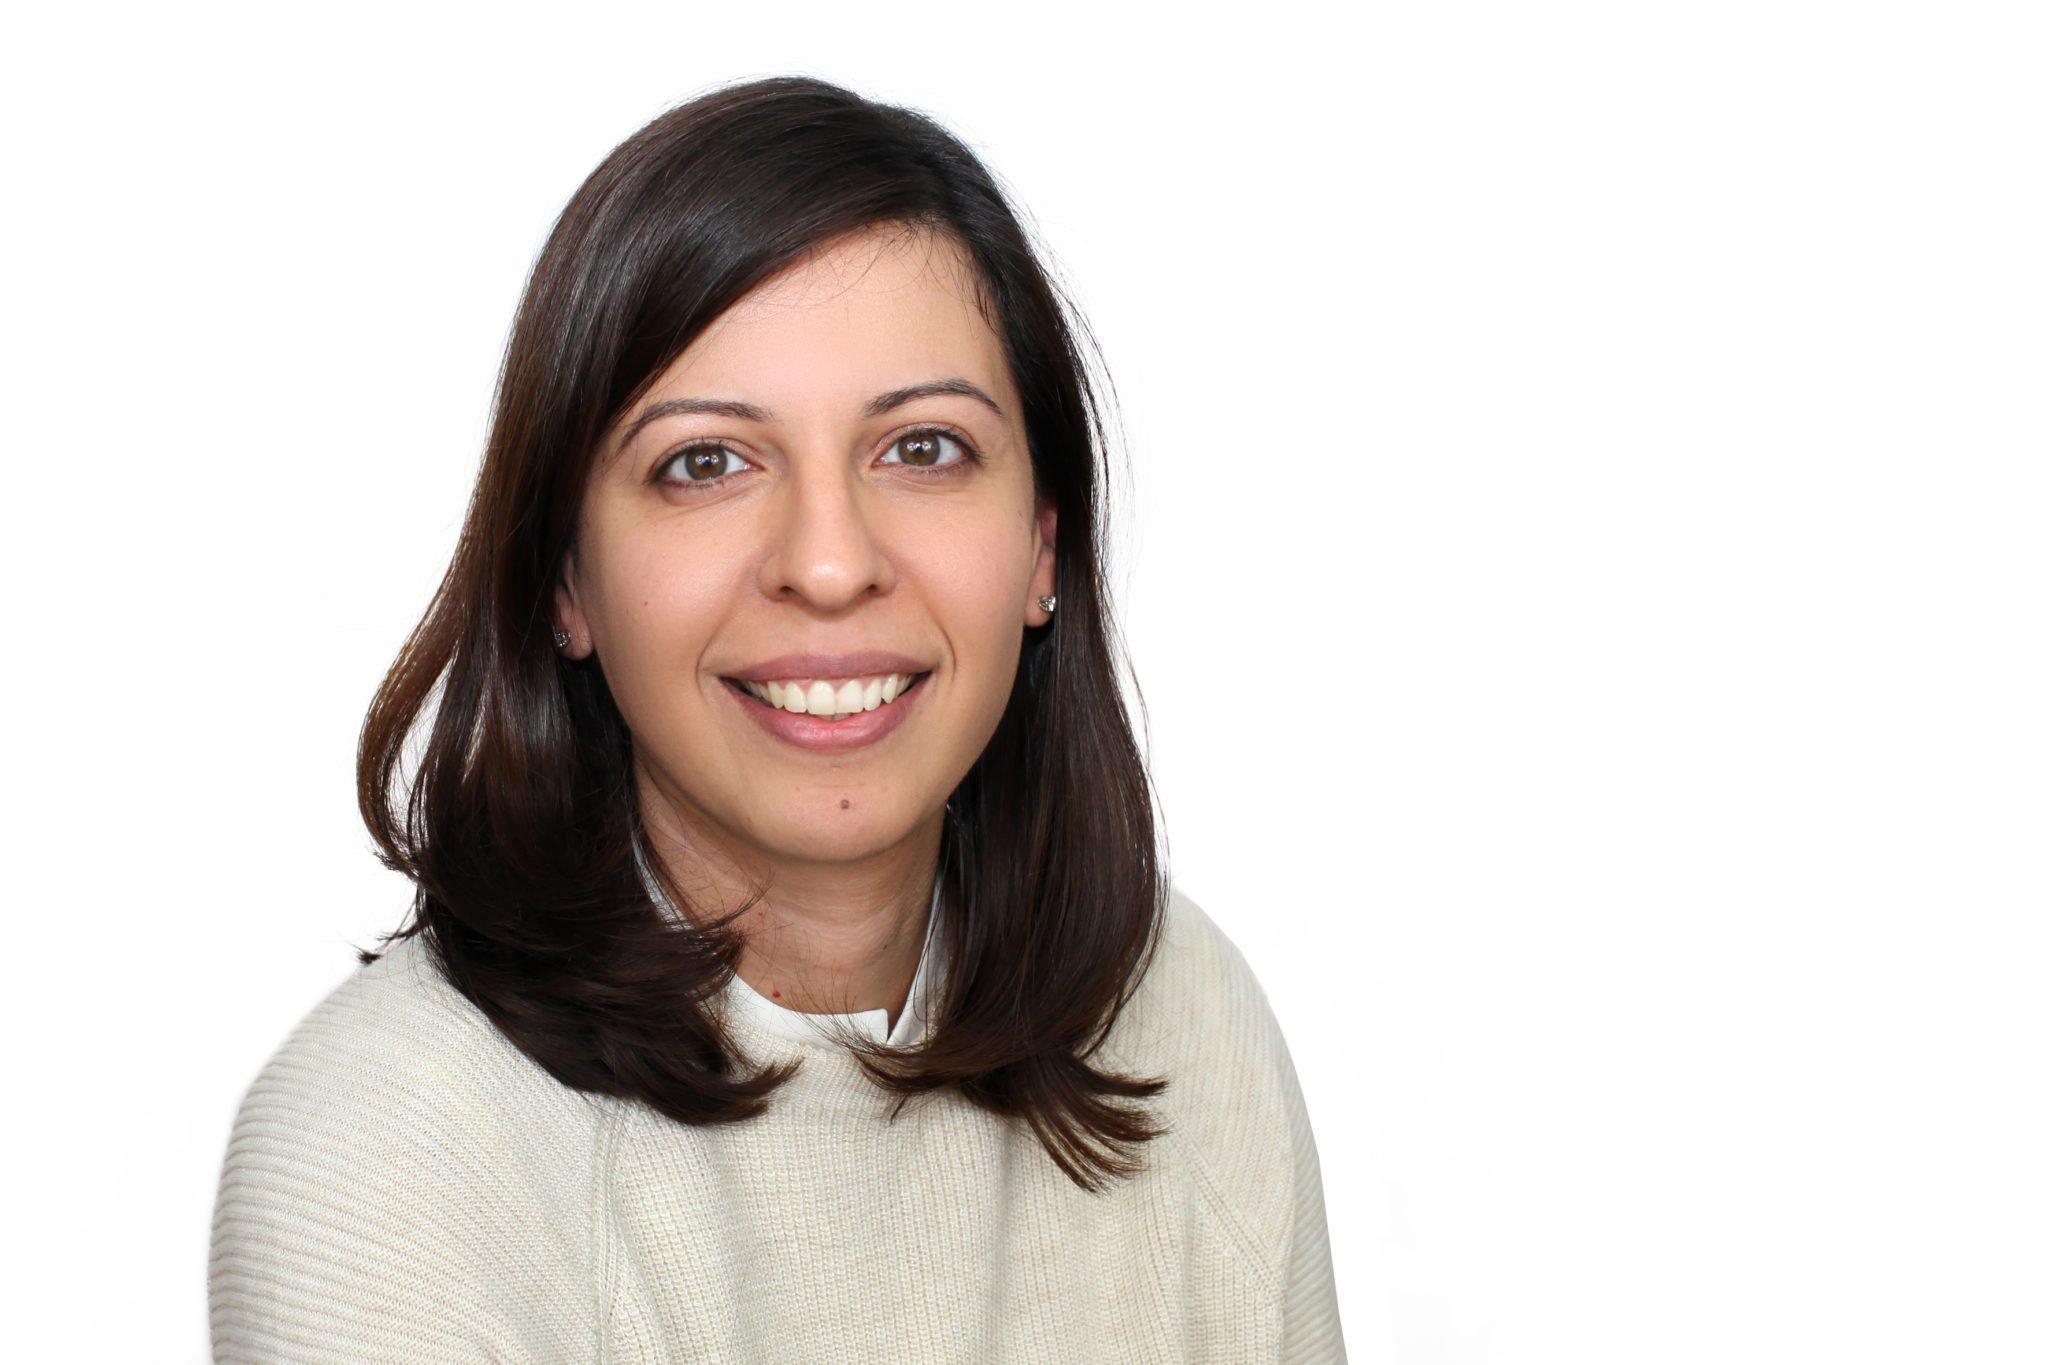 Lara Bastajian